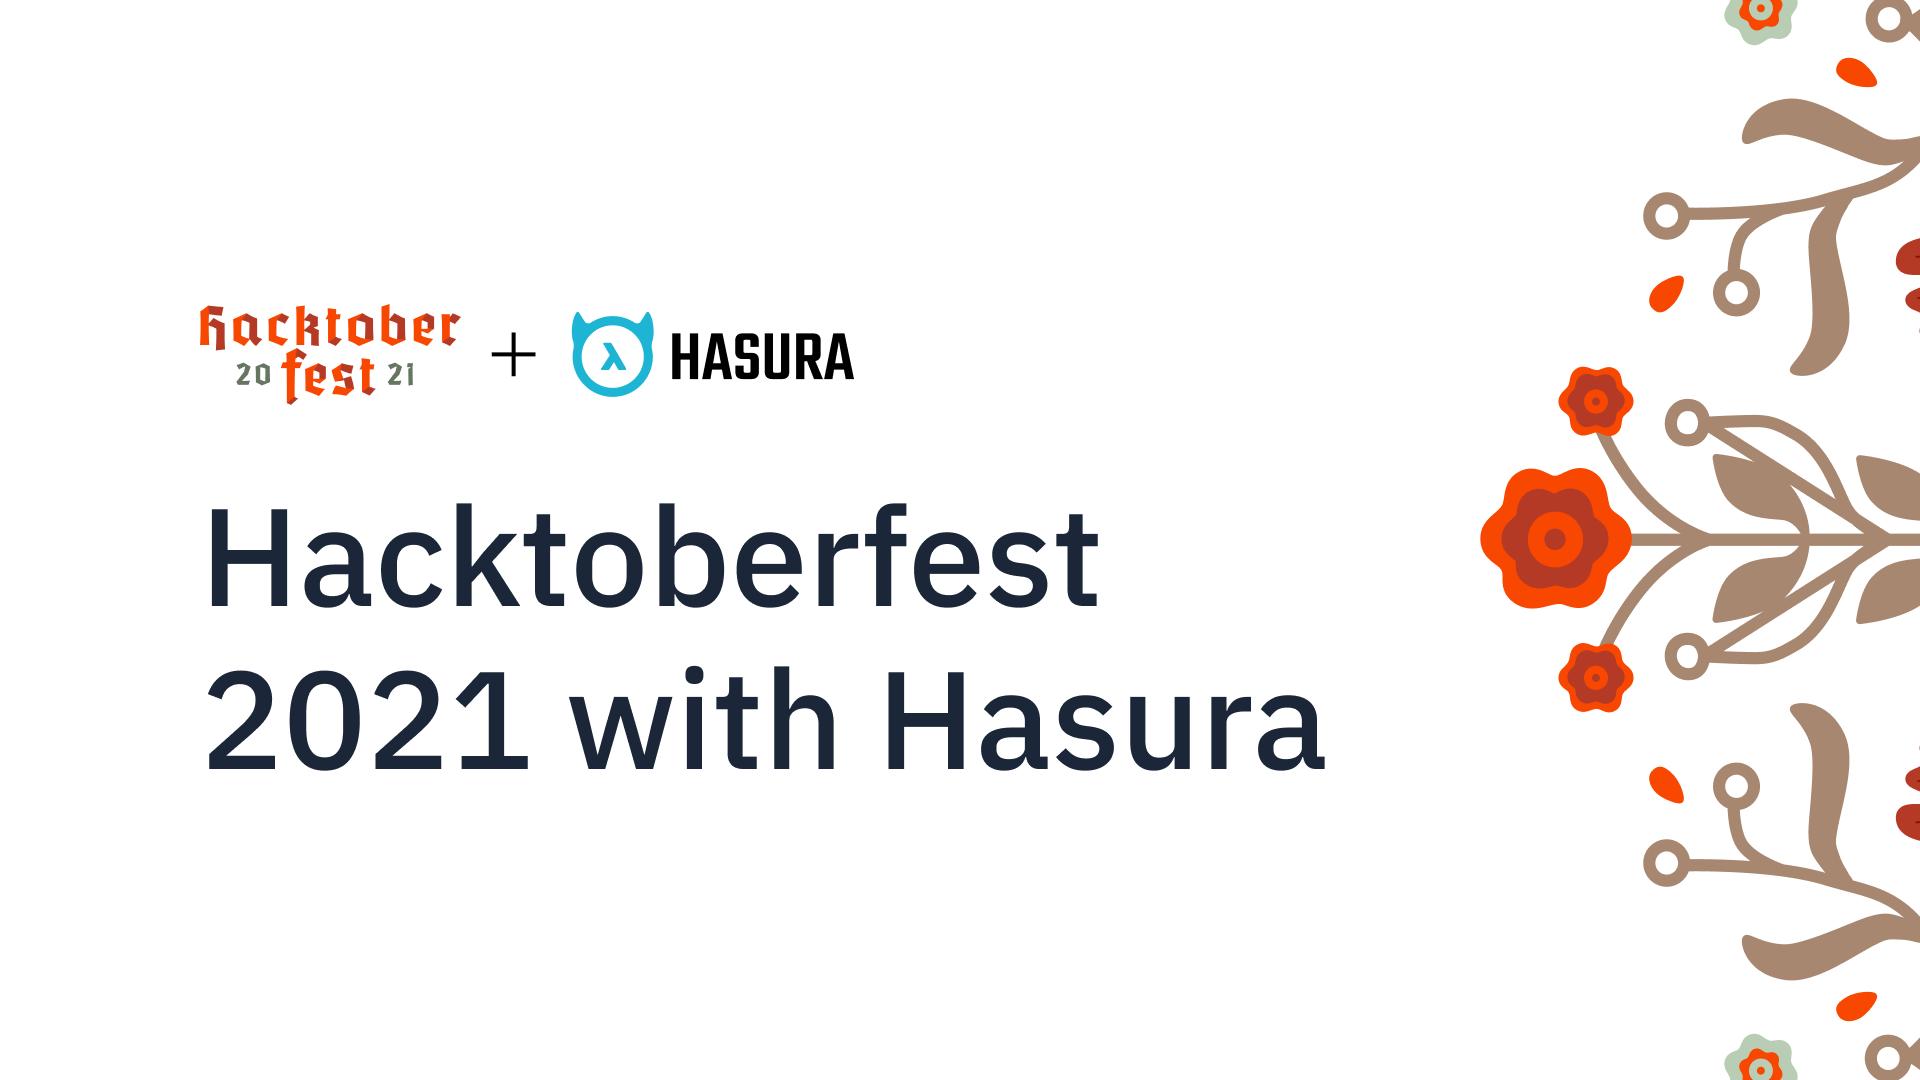 Celebrating Open-source with Hasura: Hacktoberfest & more!